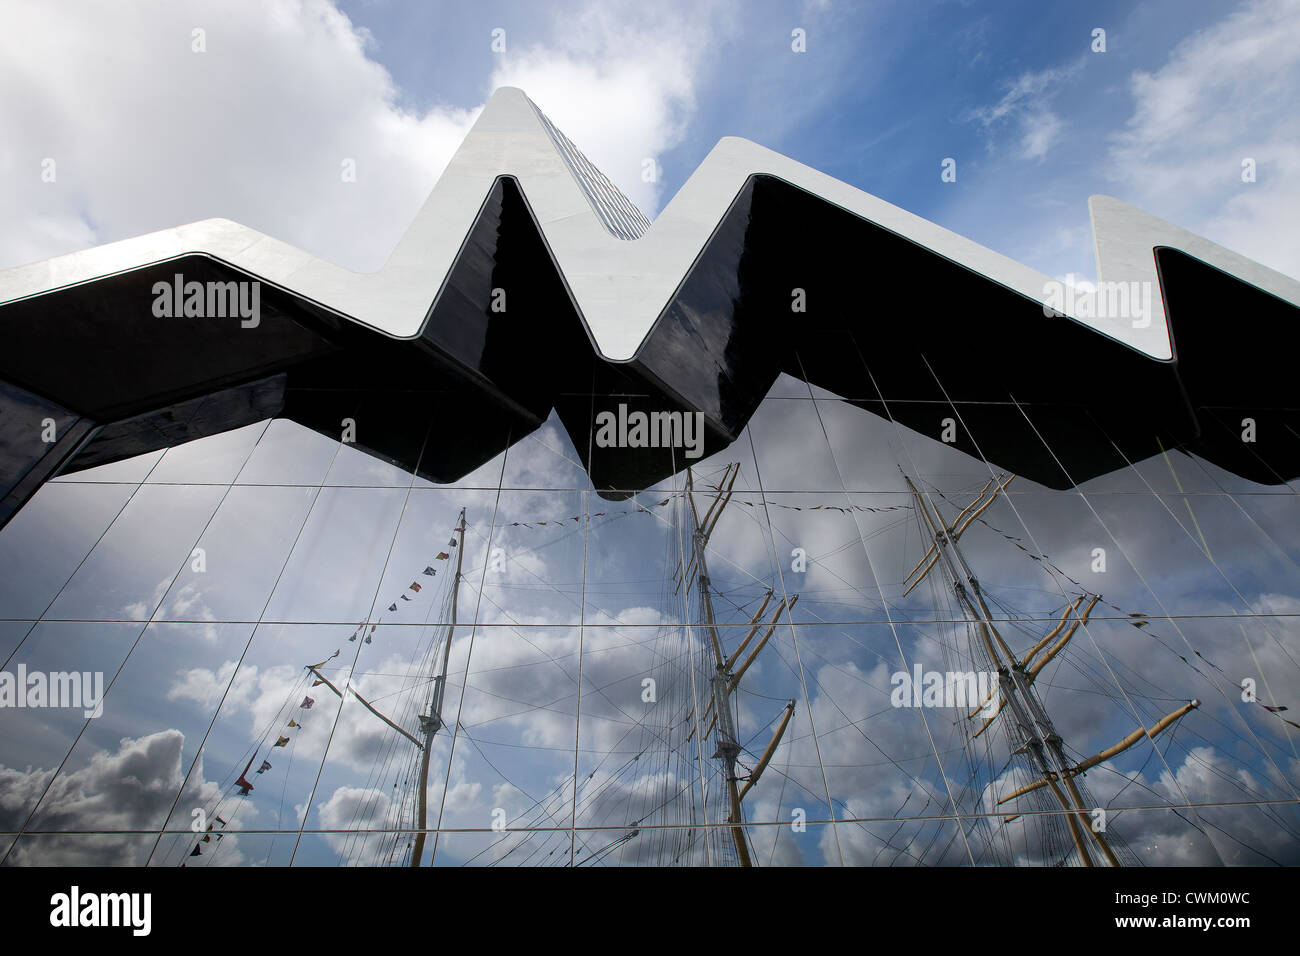 The Riverside Museum, Glasgow. Designed by Iraqi architect Zaha Hadid. - Stock Image